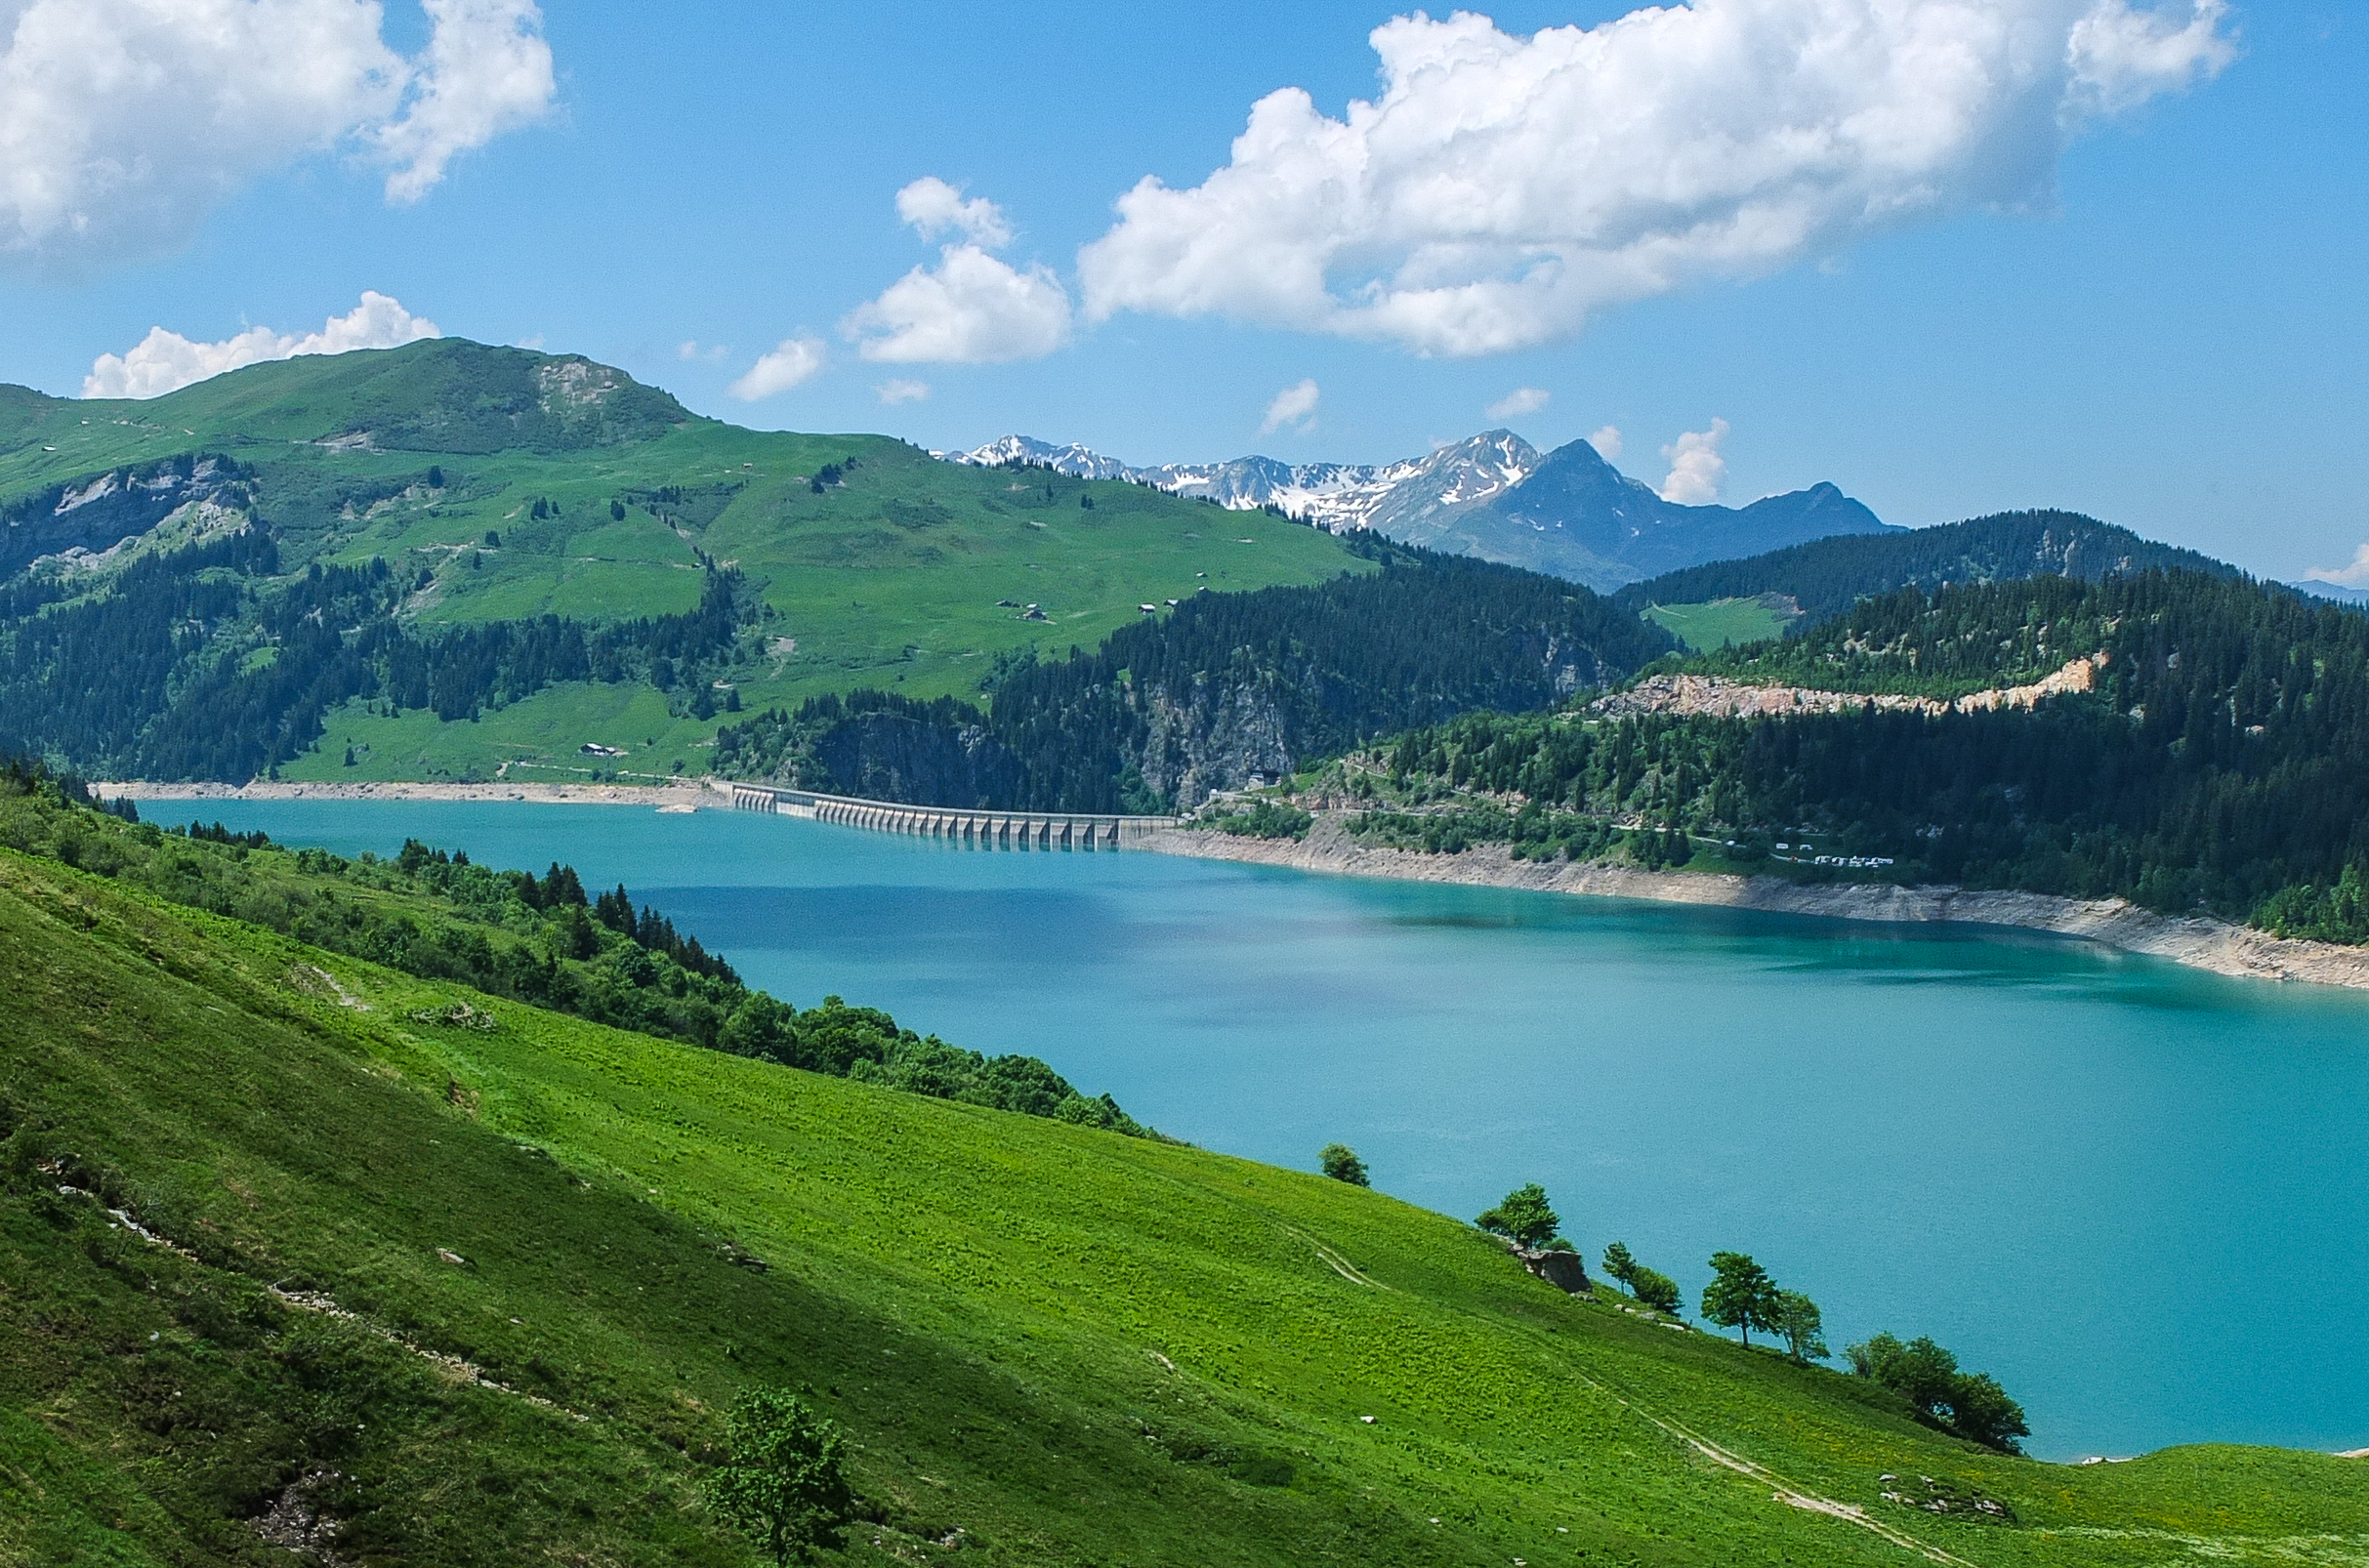 Lac_de_Roseland.jpg